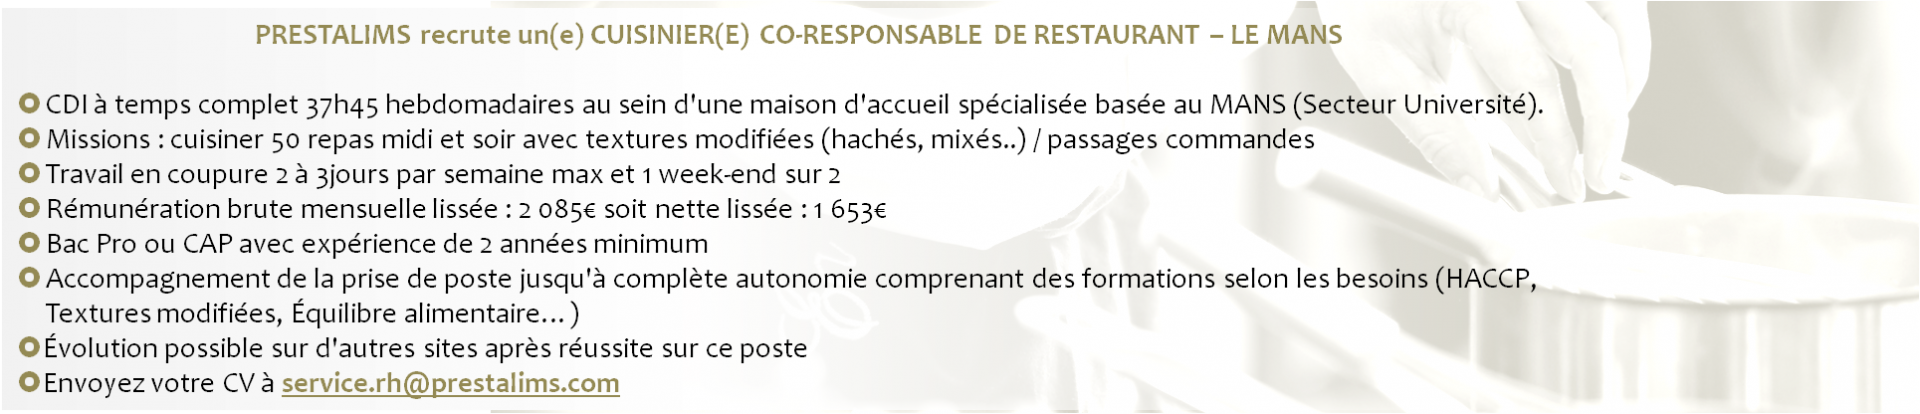 PRESTALIM'S RECRUTE CUISINIER CO-RESPONSABLE DE RESTAURANT